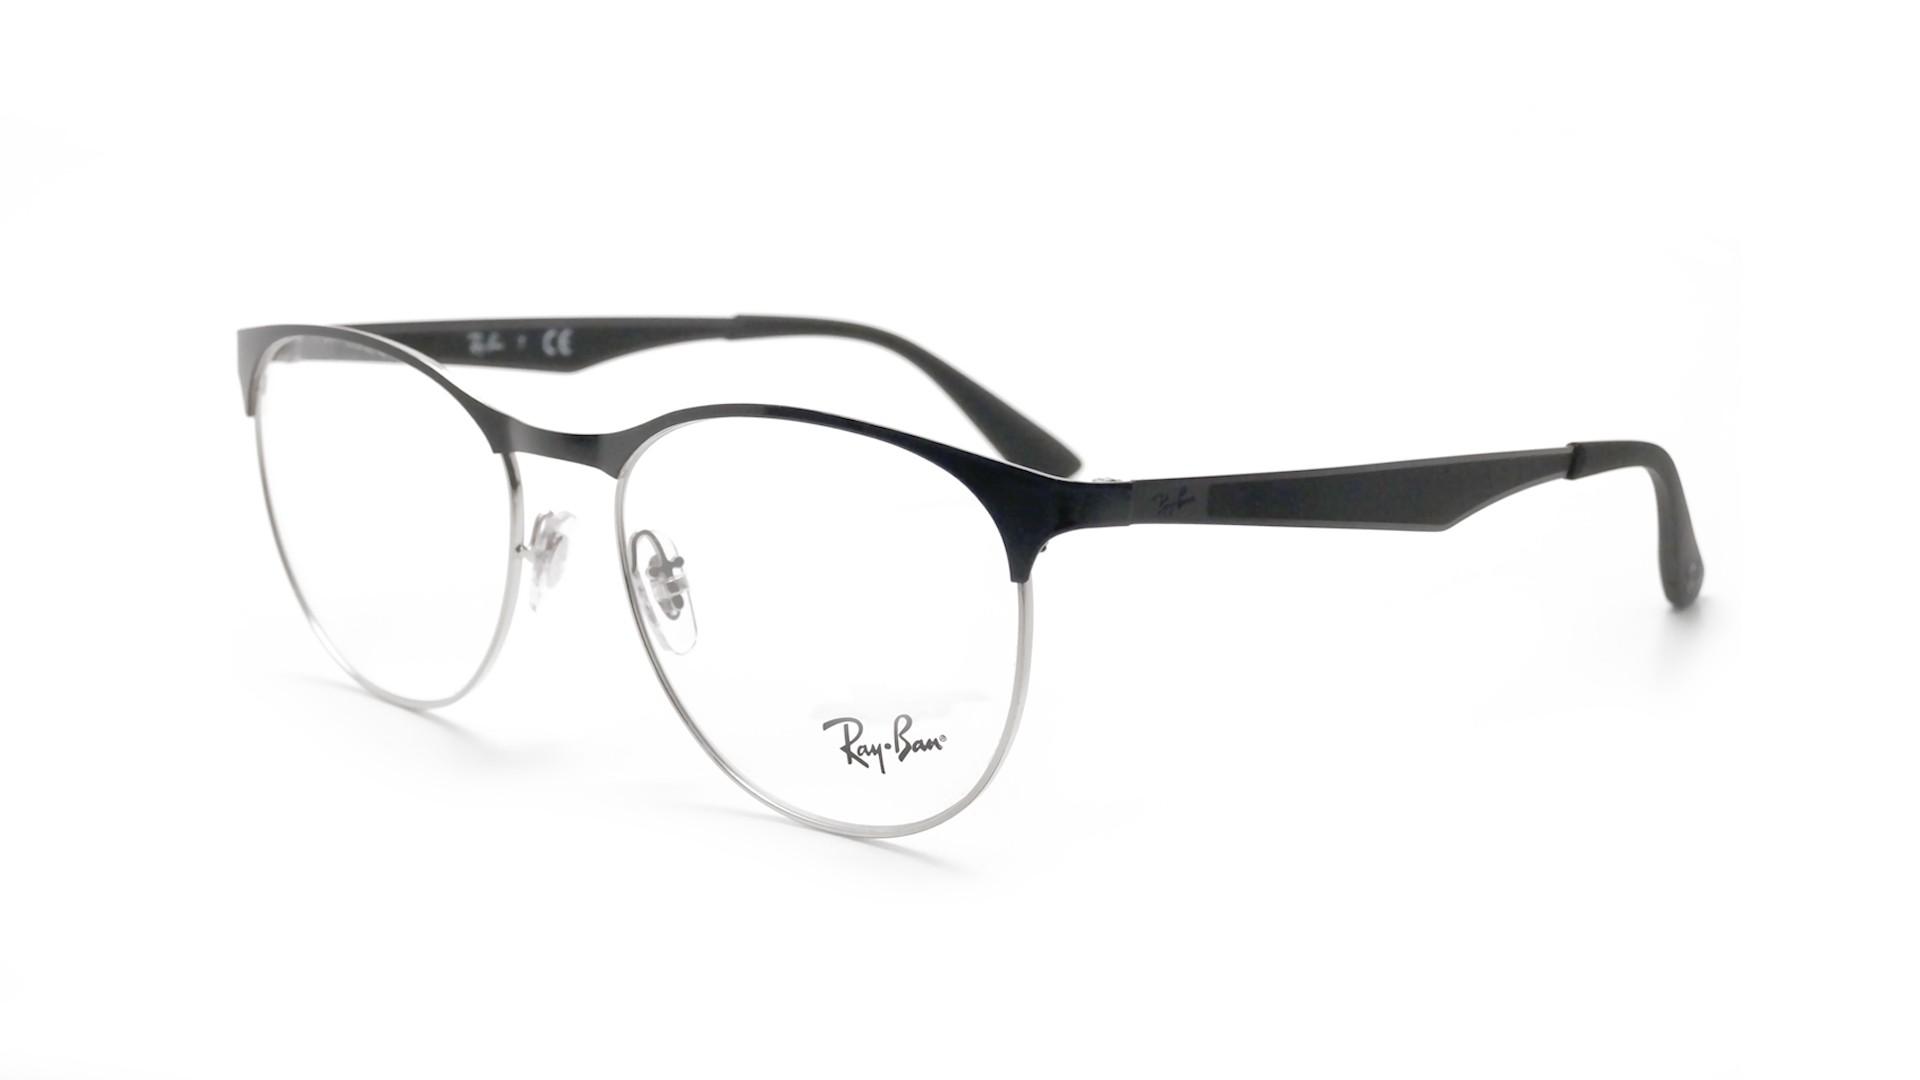 6ec6bbf7e94 Buy Ray Ban Eyeglass Frames 135 « Heritage Malta